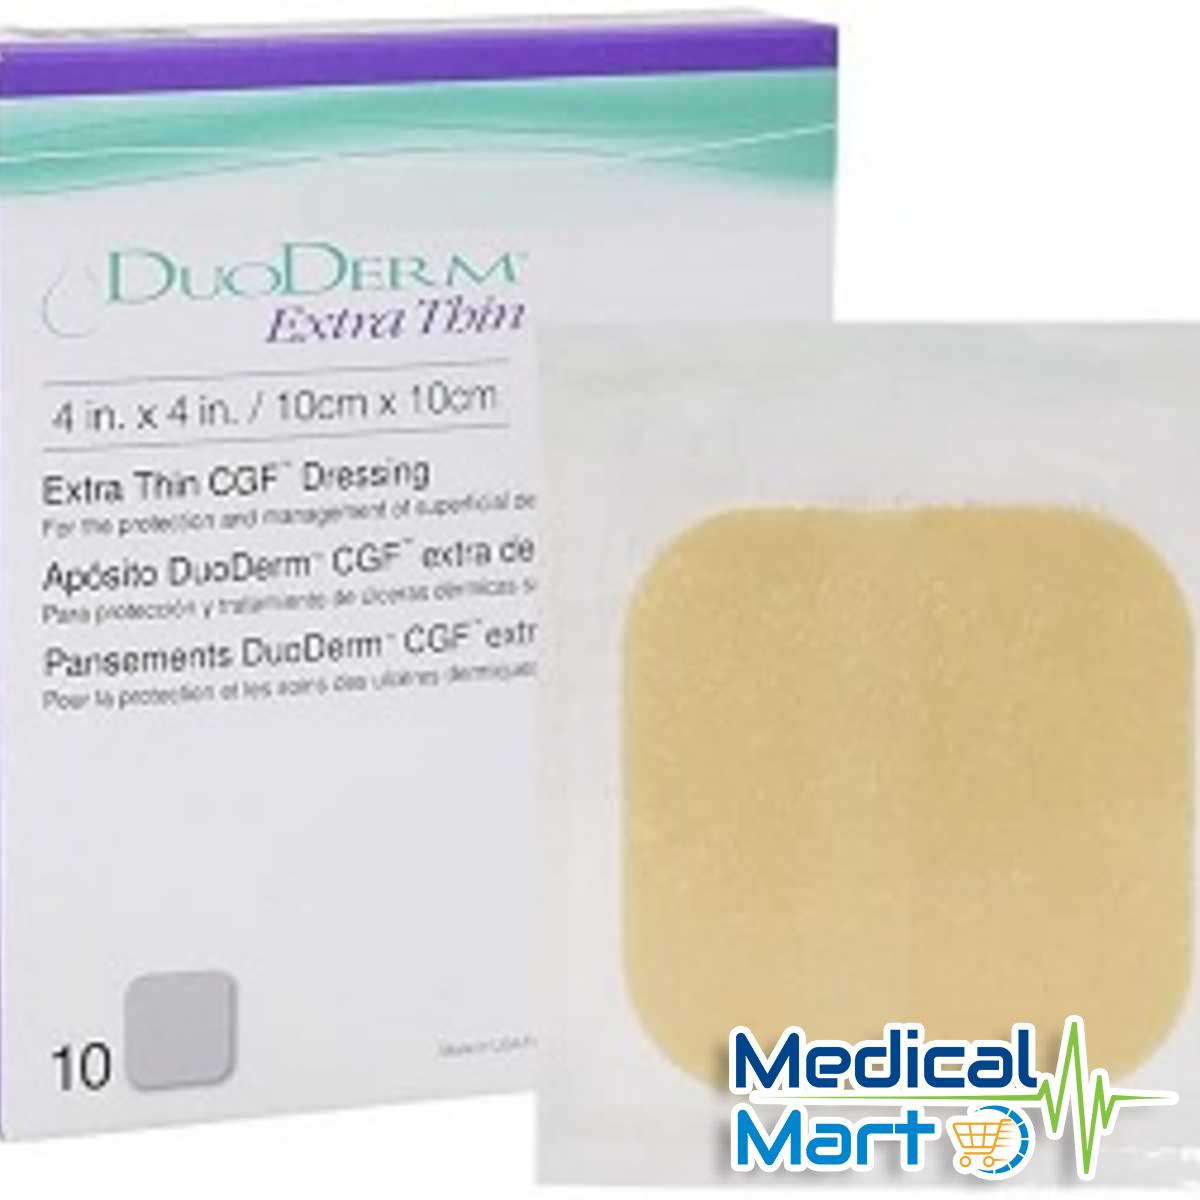 Duoderm Extra Thin Hydrocolloid Dressing, 10cm x 10cm